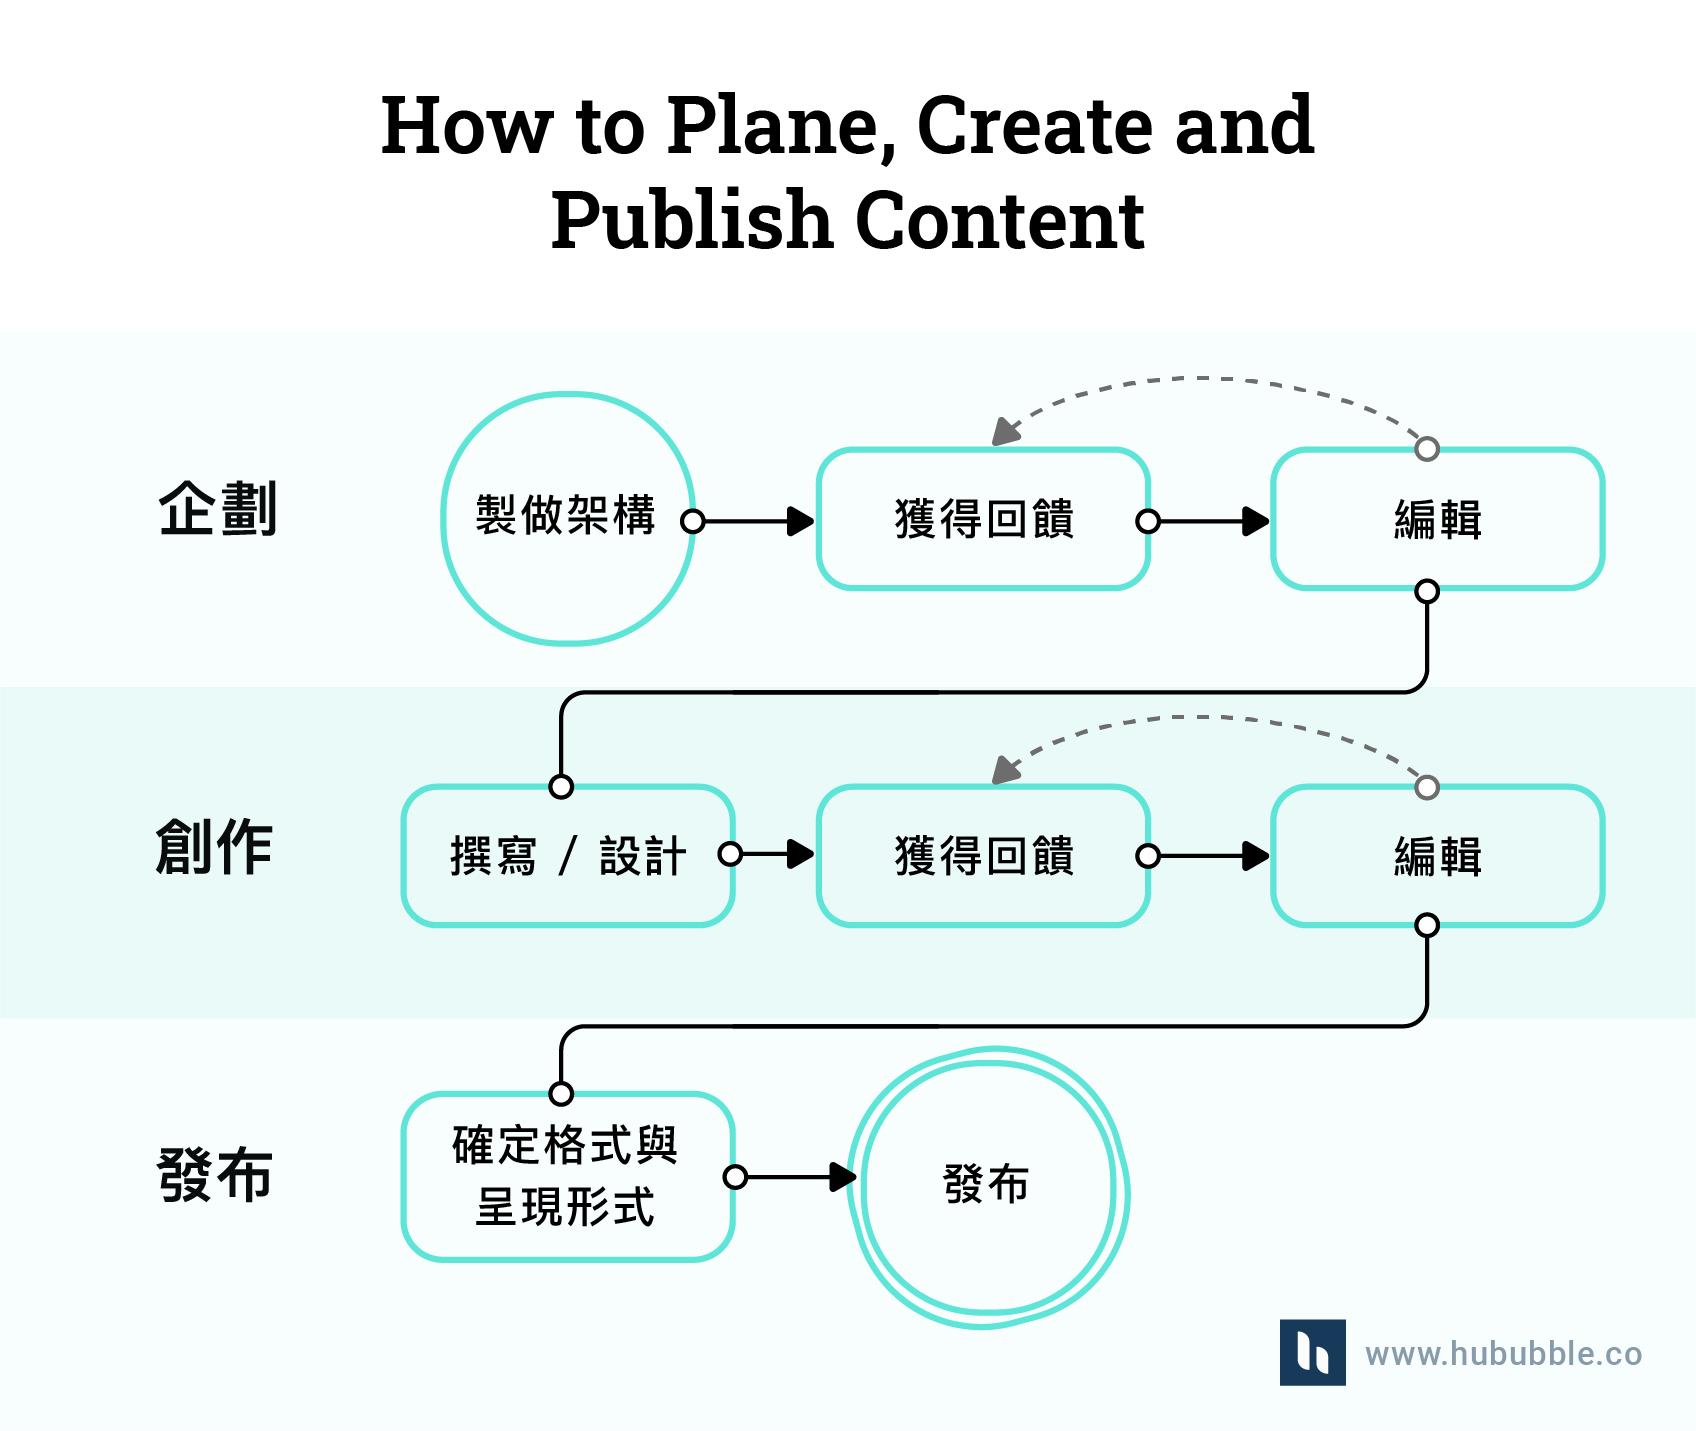 how to plane、creat、publish content